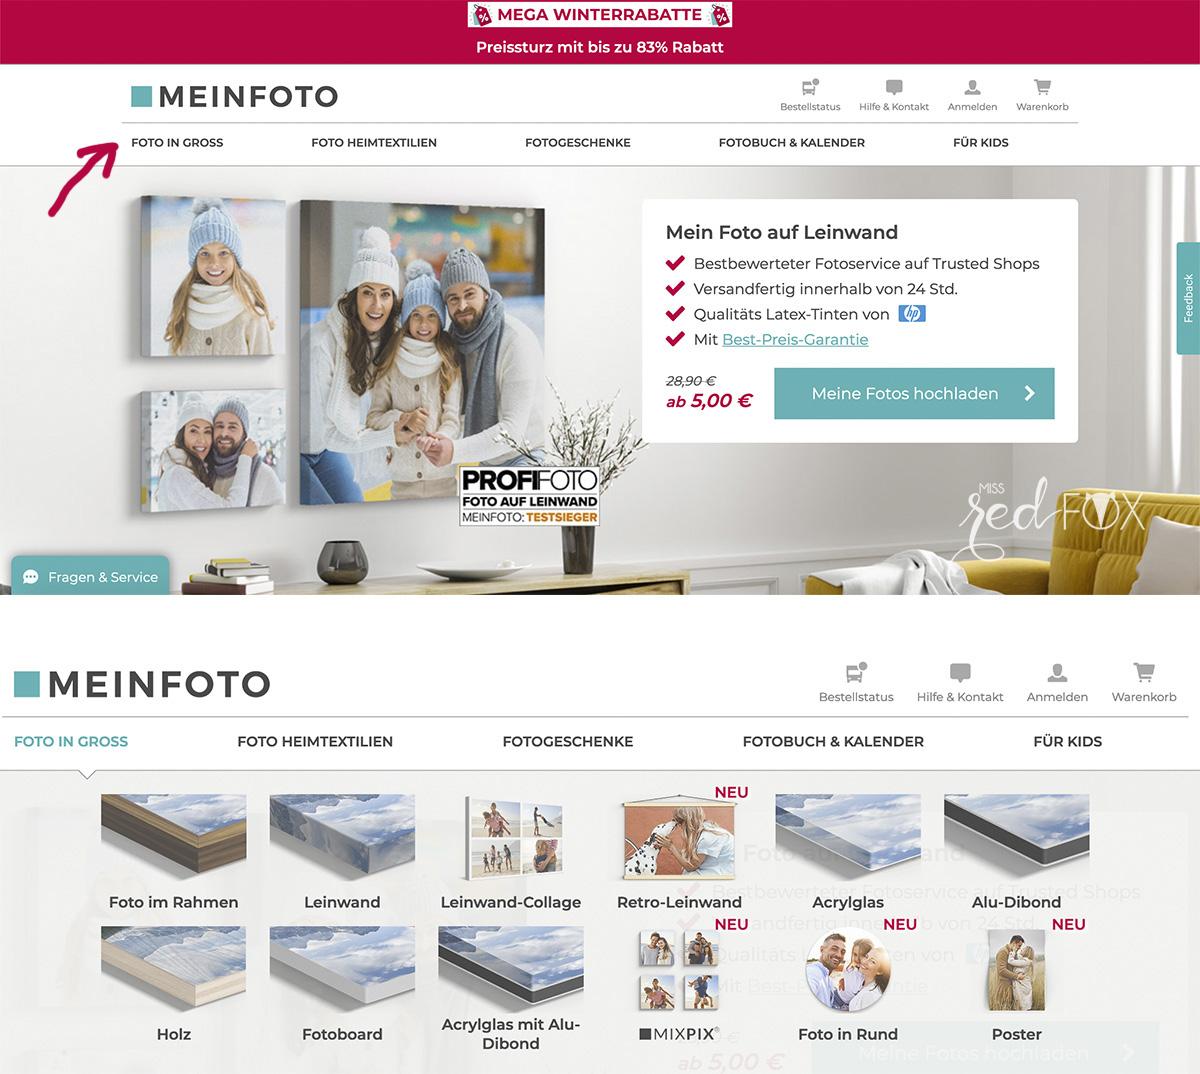 missredfox - MEINFOTO - DIY Pin-Leinwand Weltkarte - 03